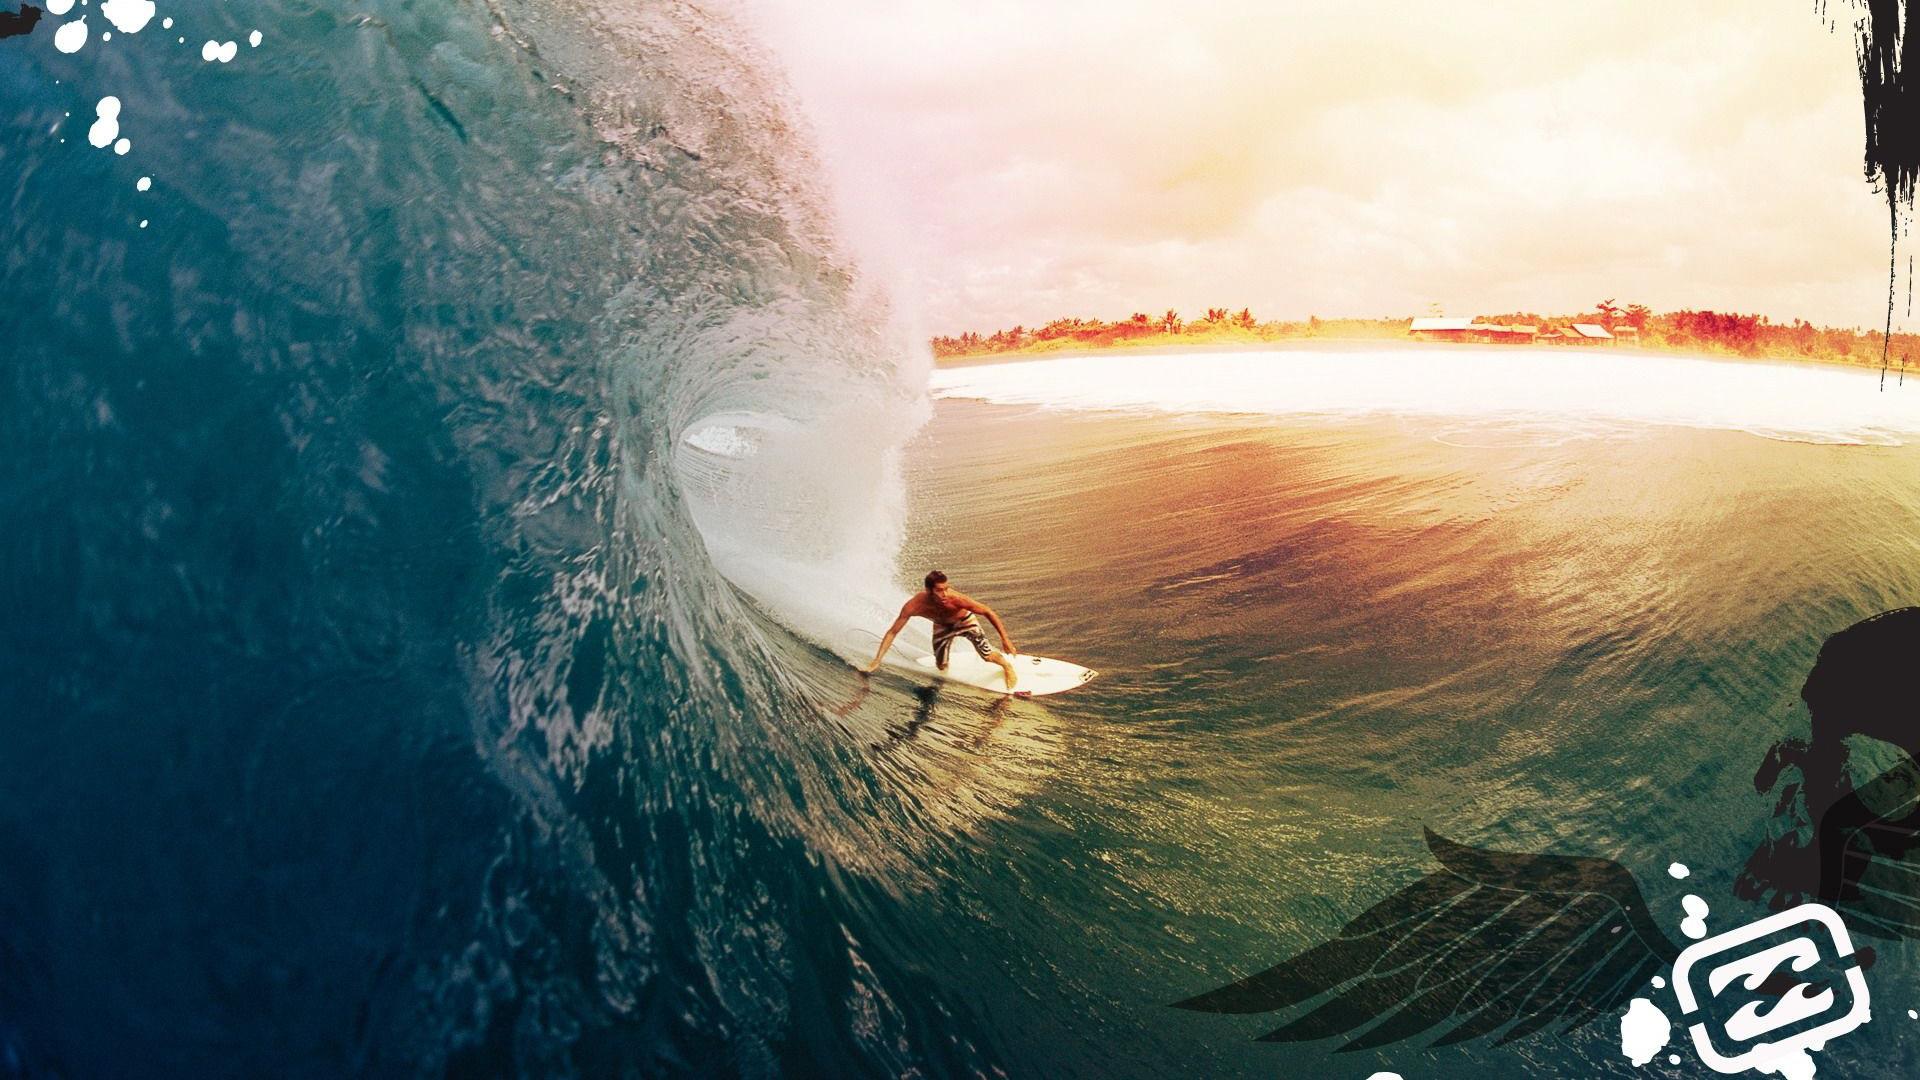 Surfer, surfing 1080p Full HD desktop background   Full HD Wallpapers .